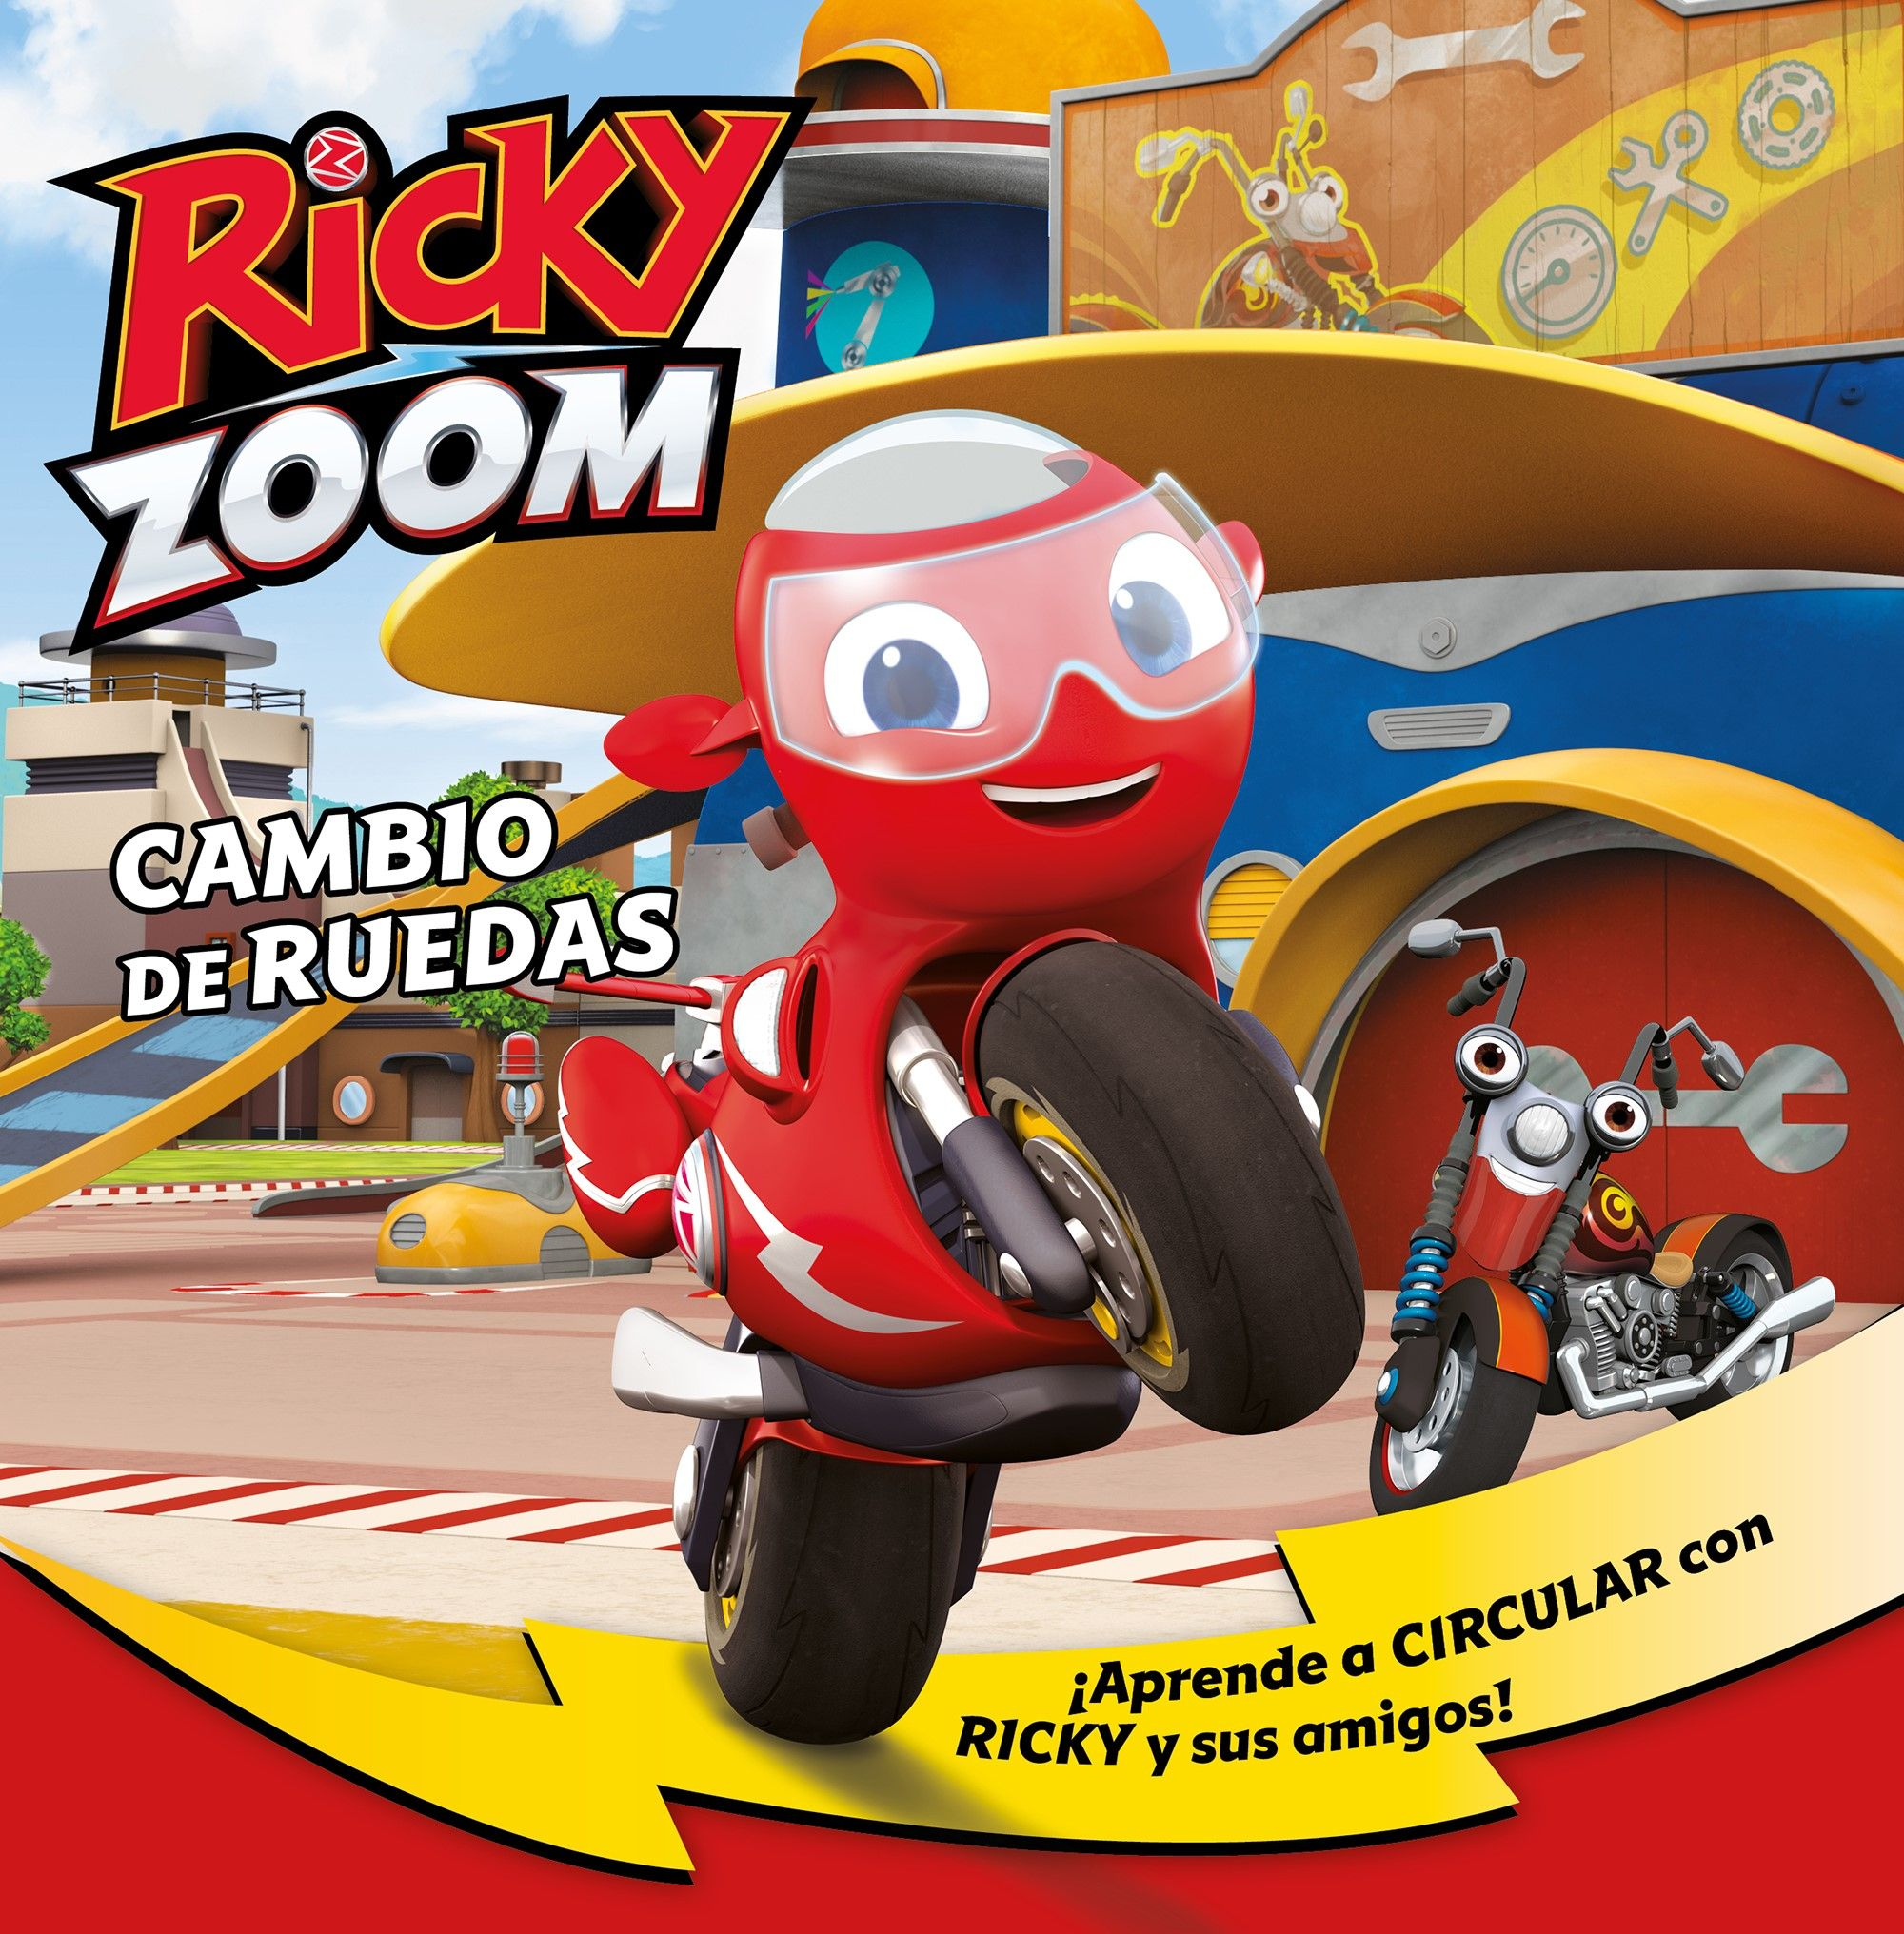 RICKY ZOOM 3 CAMBIO DE RUEDAS